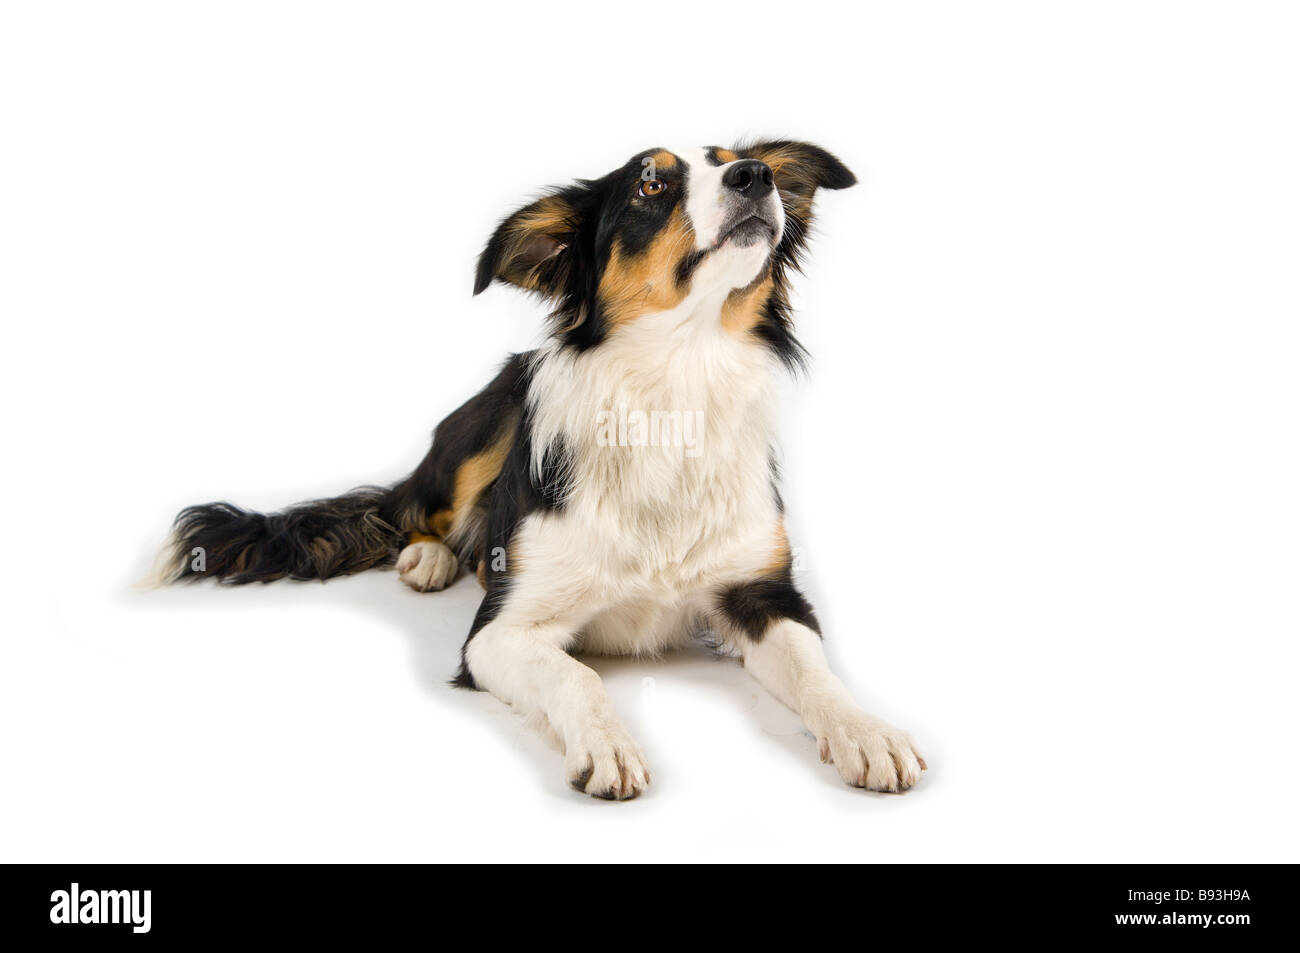 cute dog in studio - Stock Image